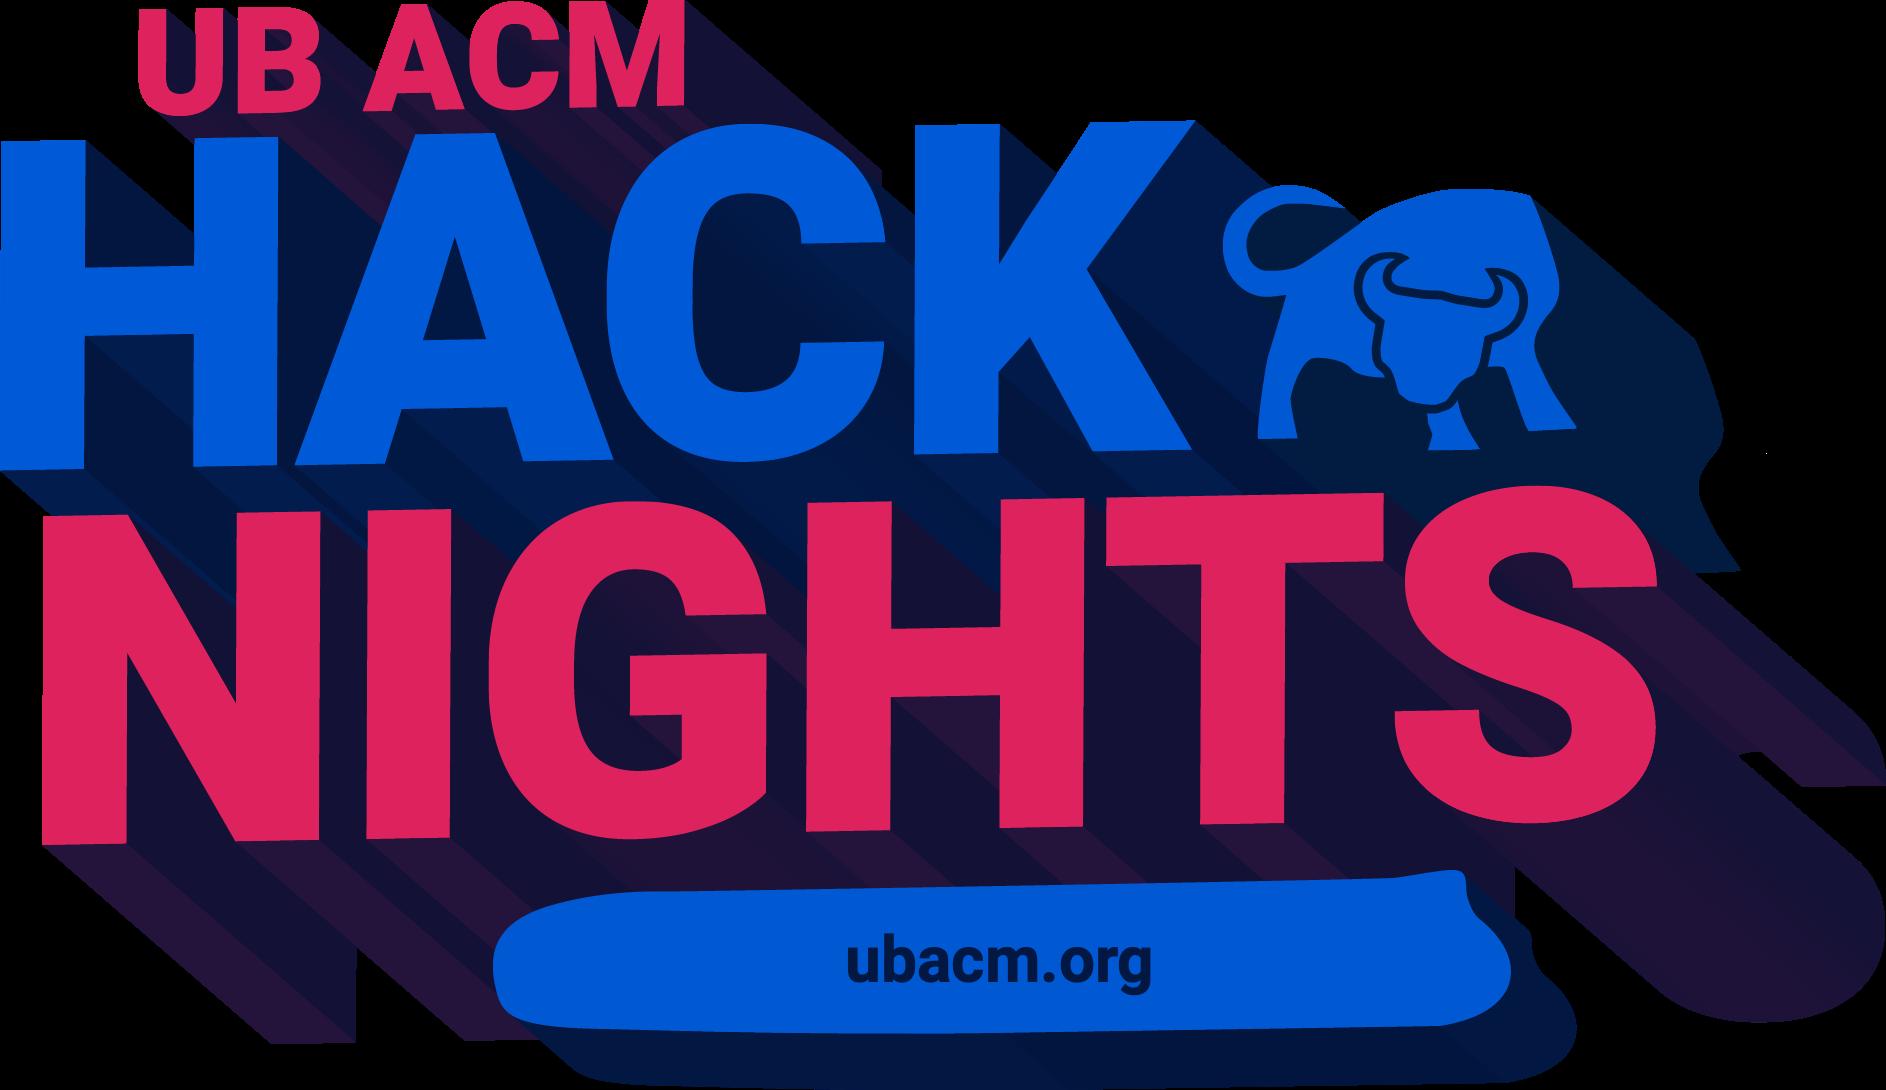 UB ACM - University at Buffalo's Association for Computing